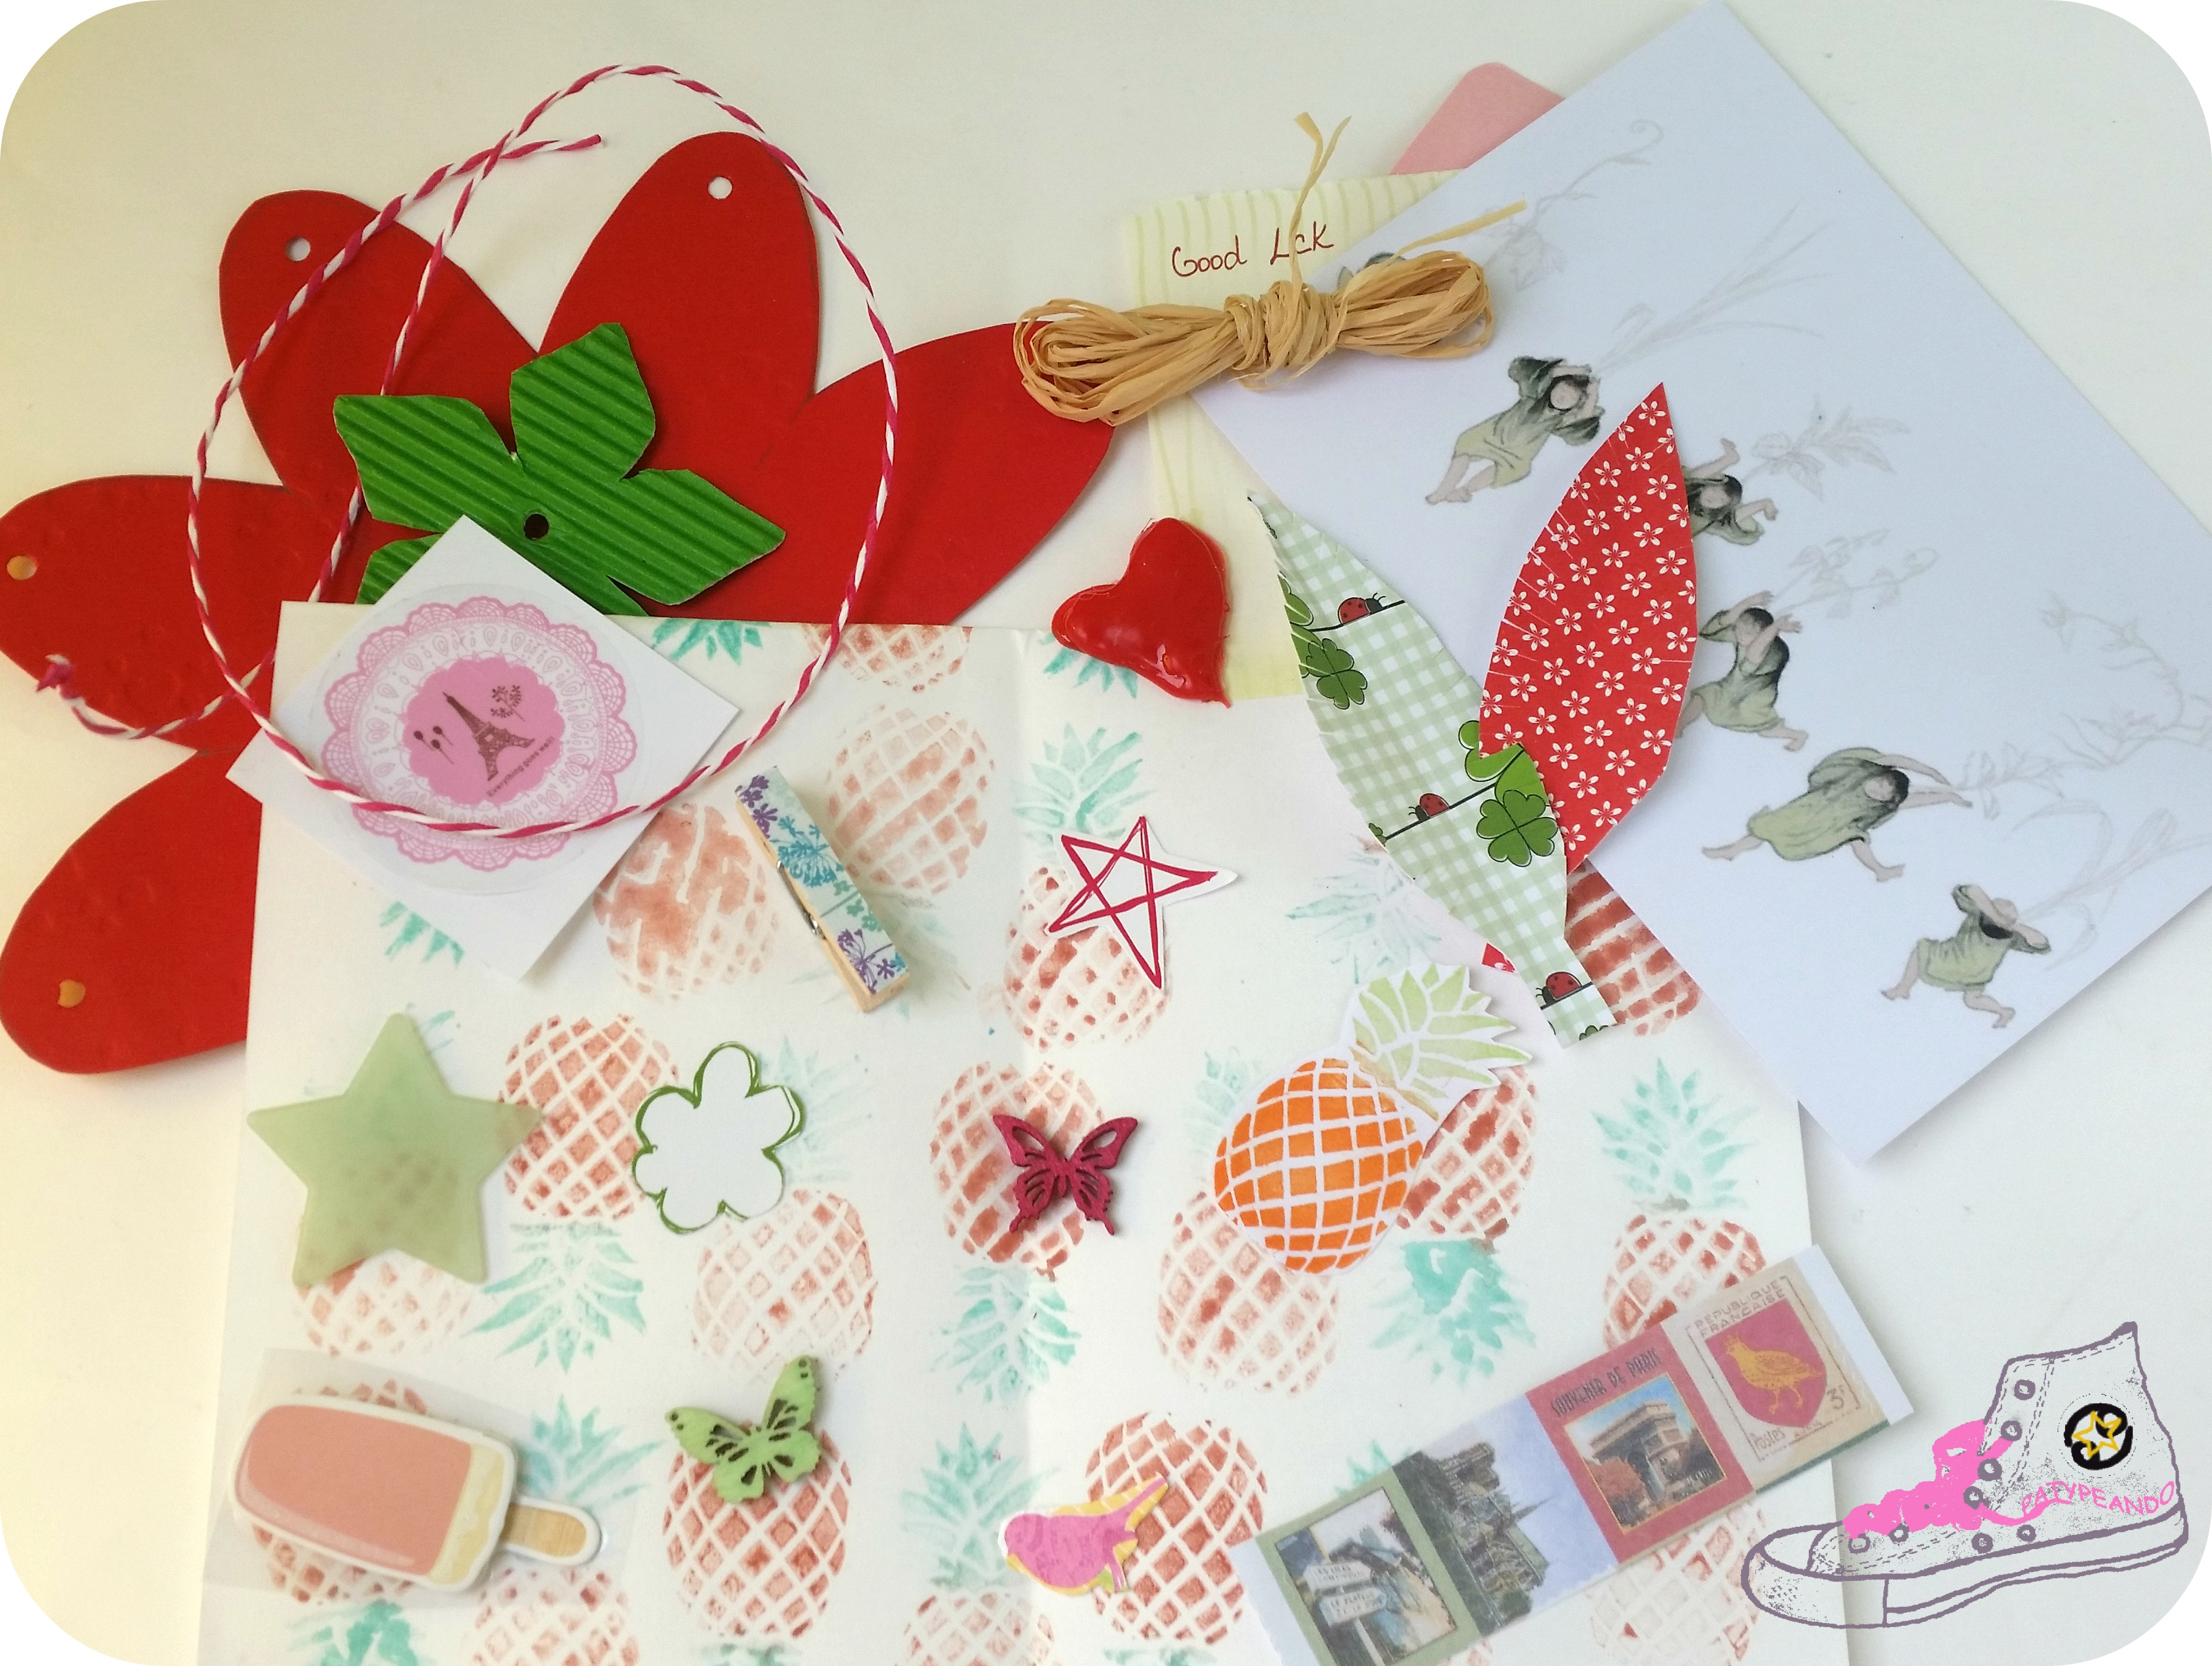 intercambio cartas bonitas